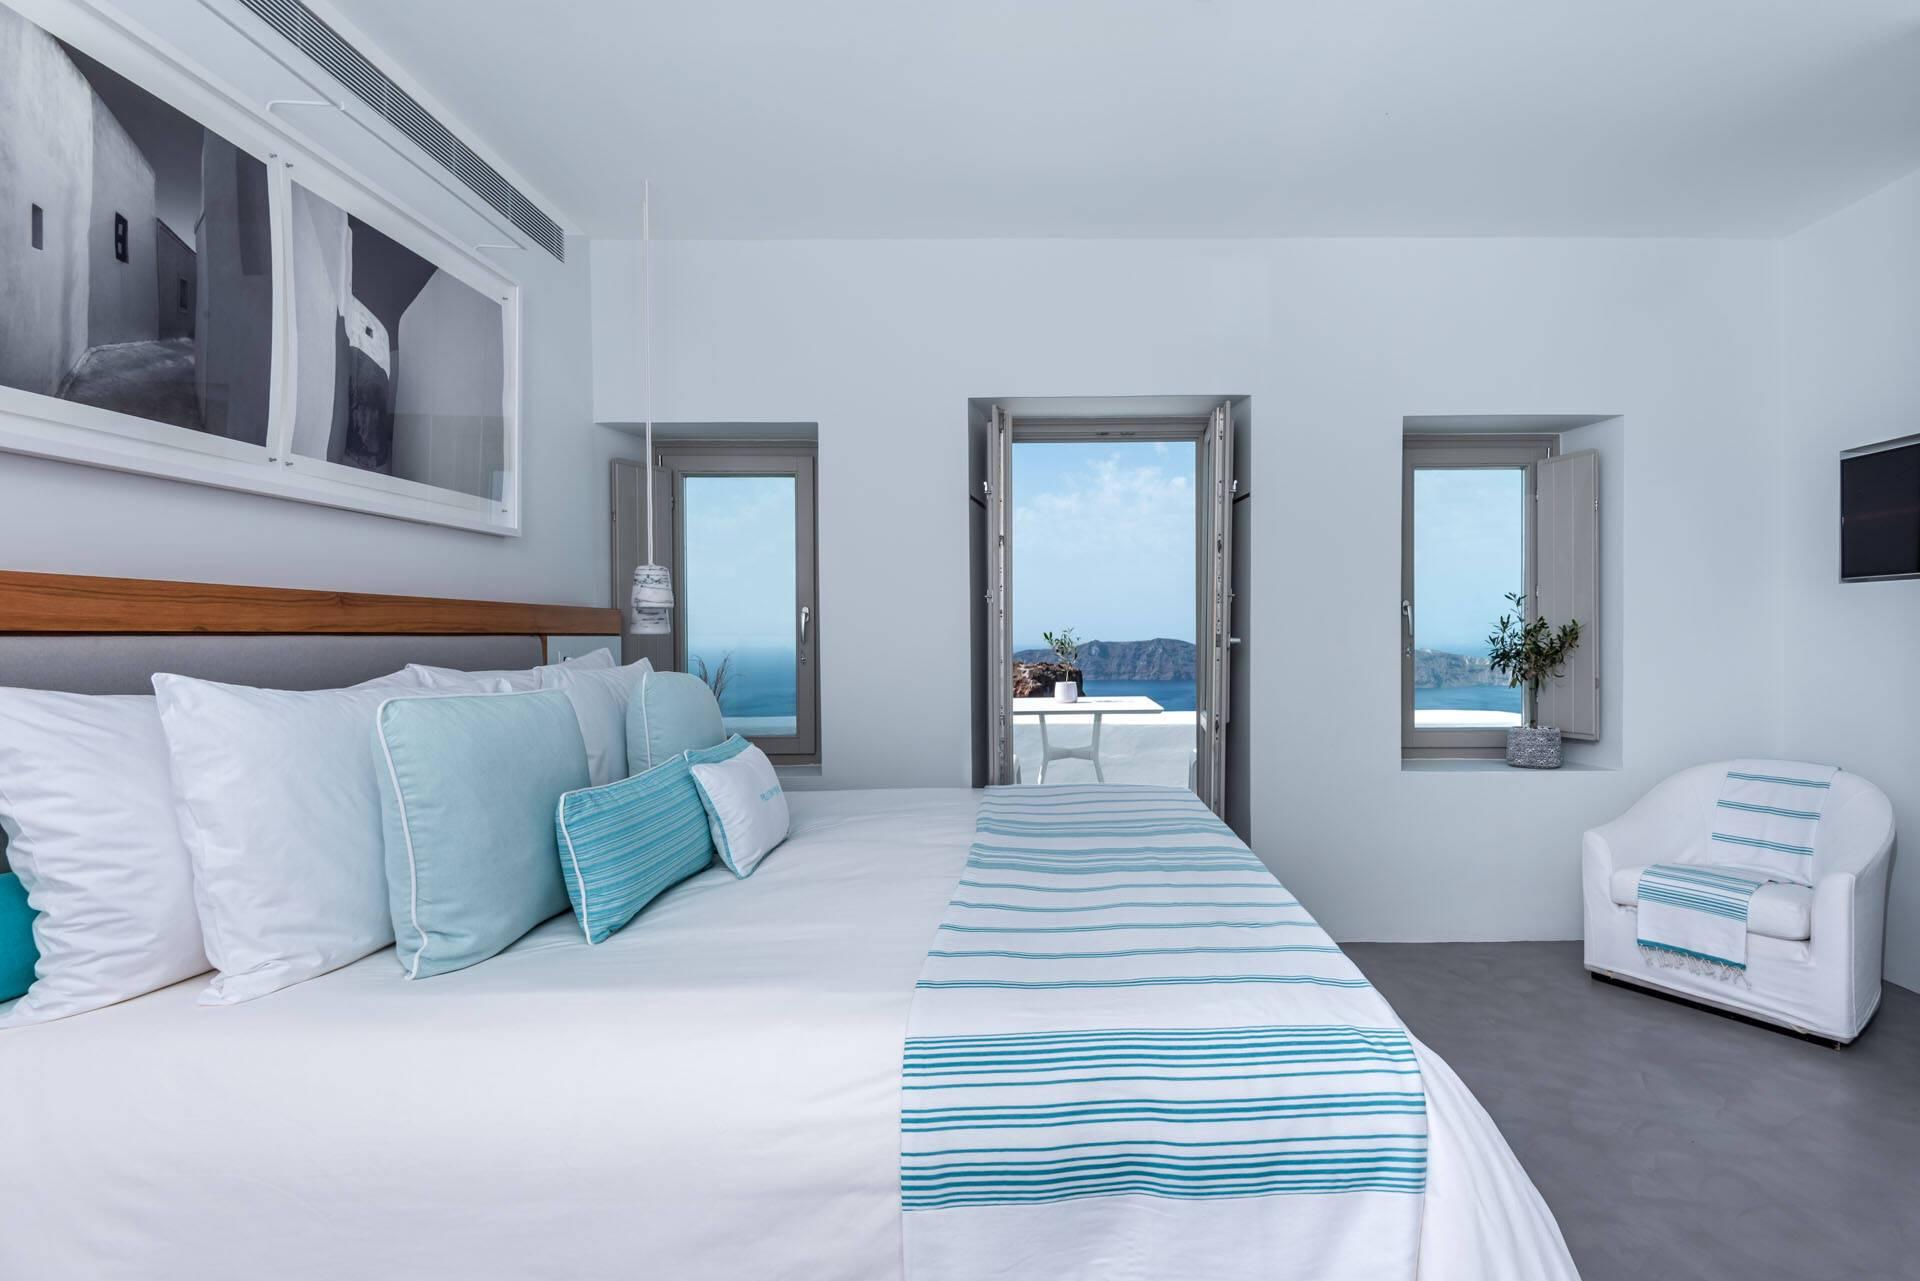 Grace Hotel Santorin Chambre Vue